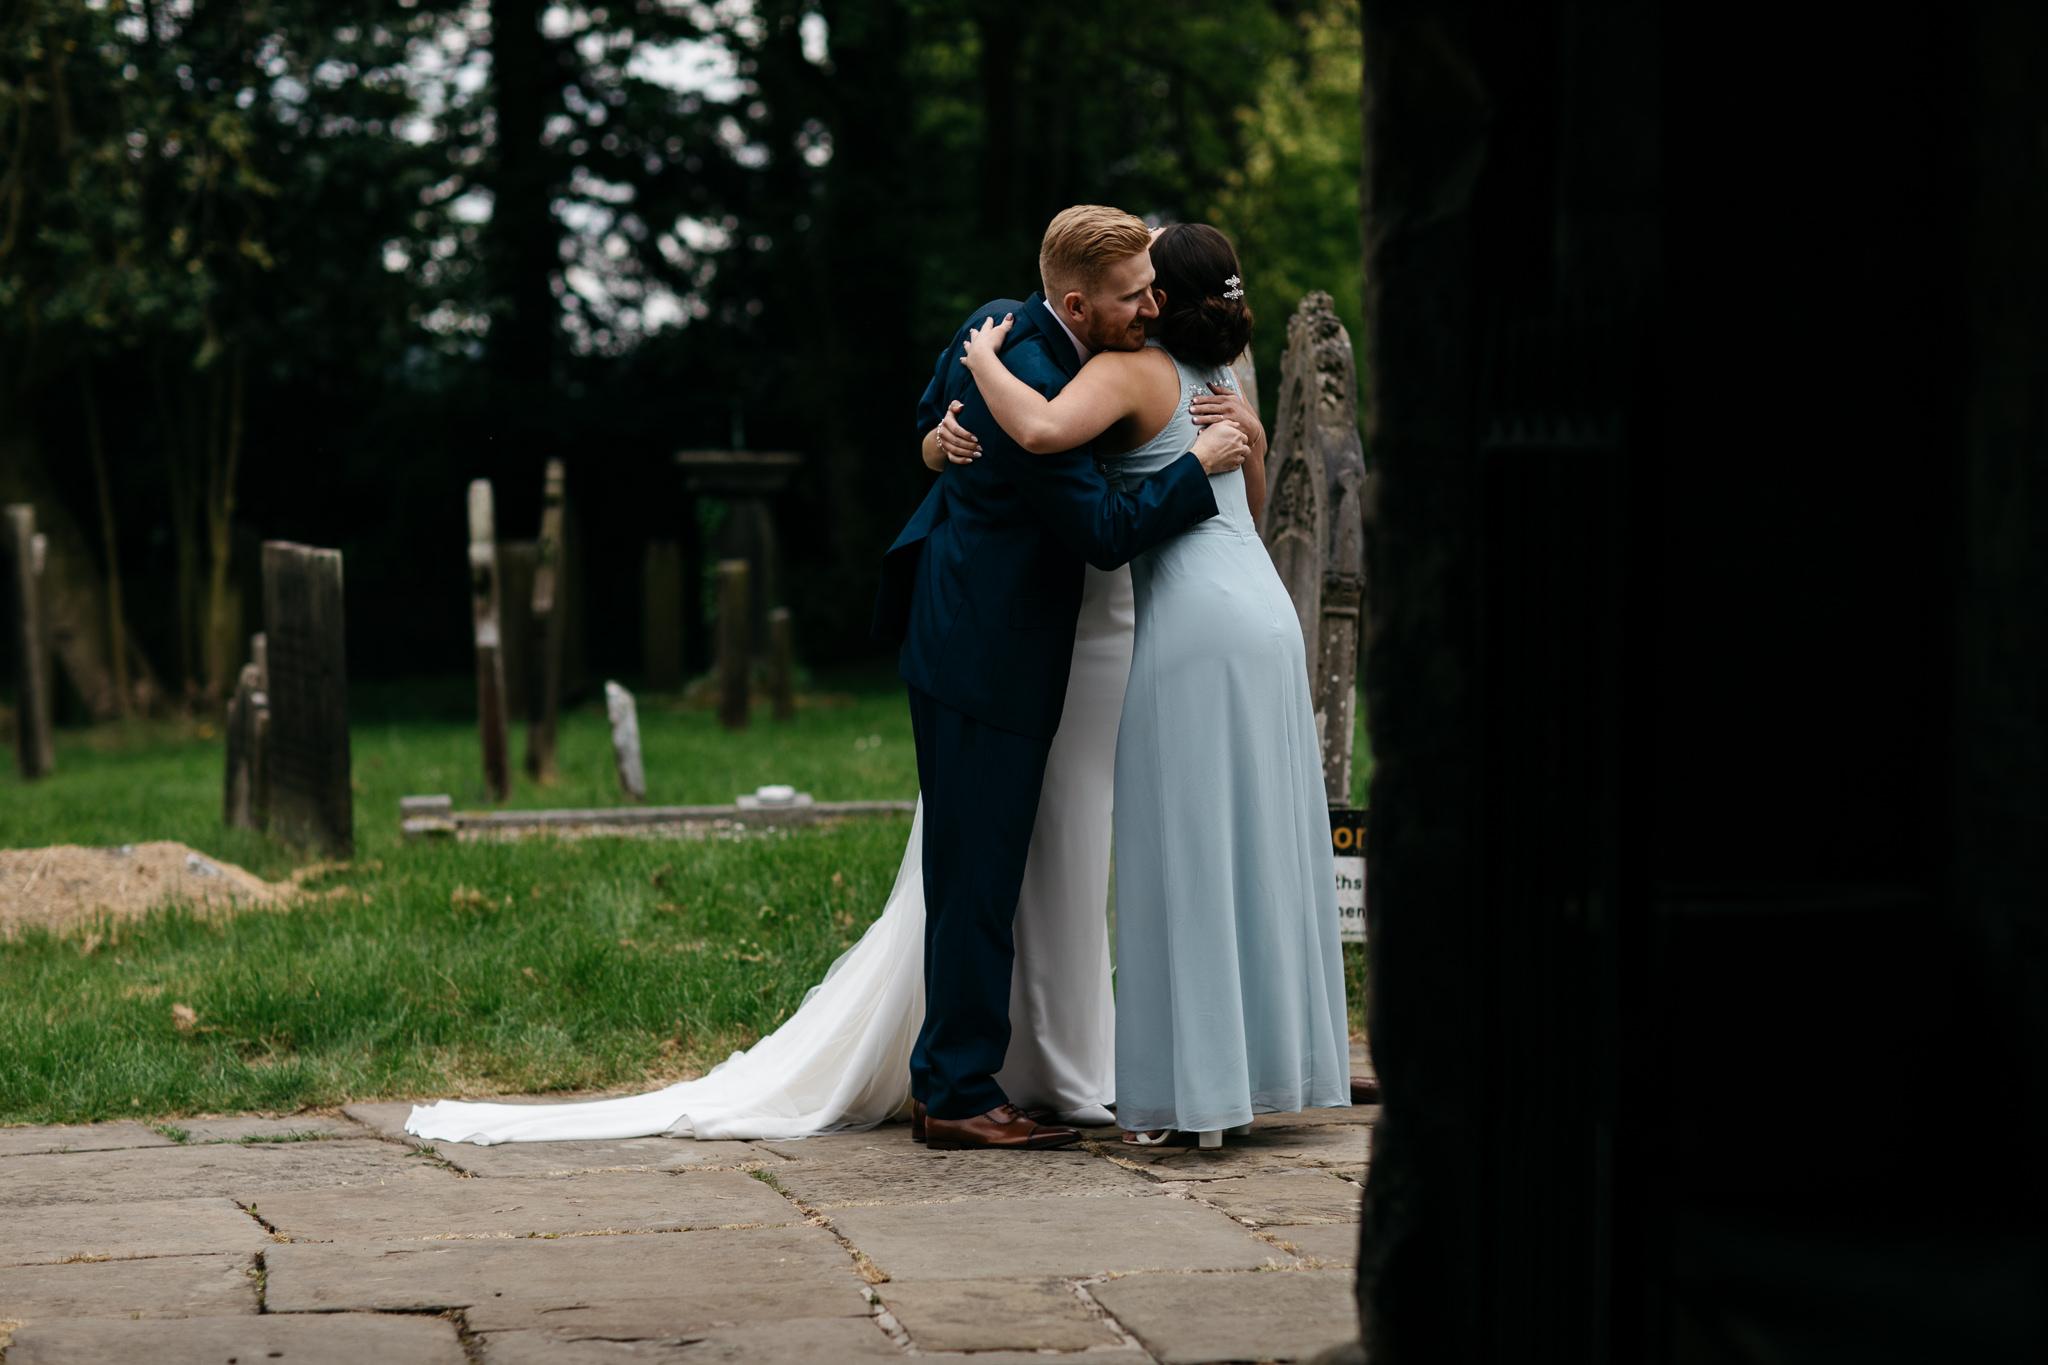 Sheffield_Wedding_Photographer (25 of 44)